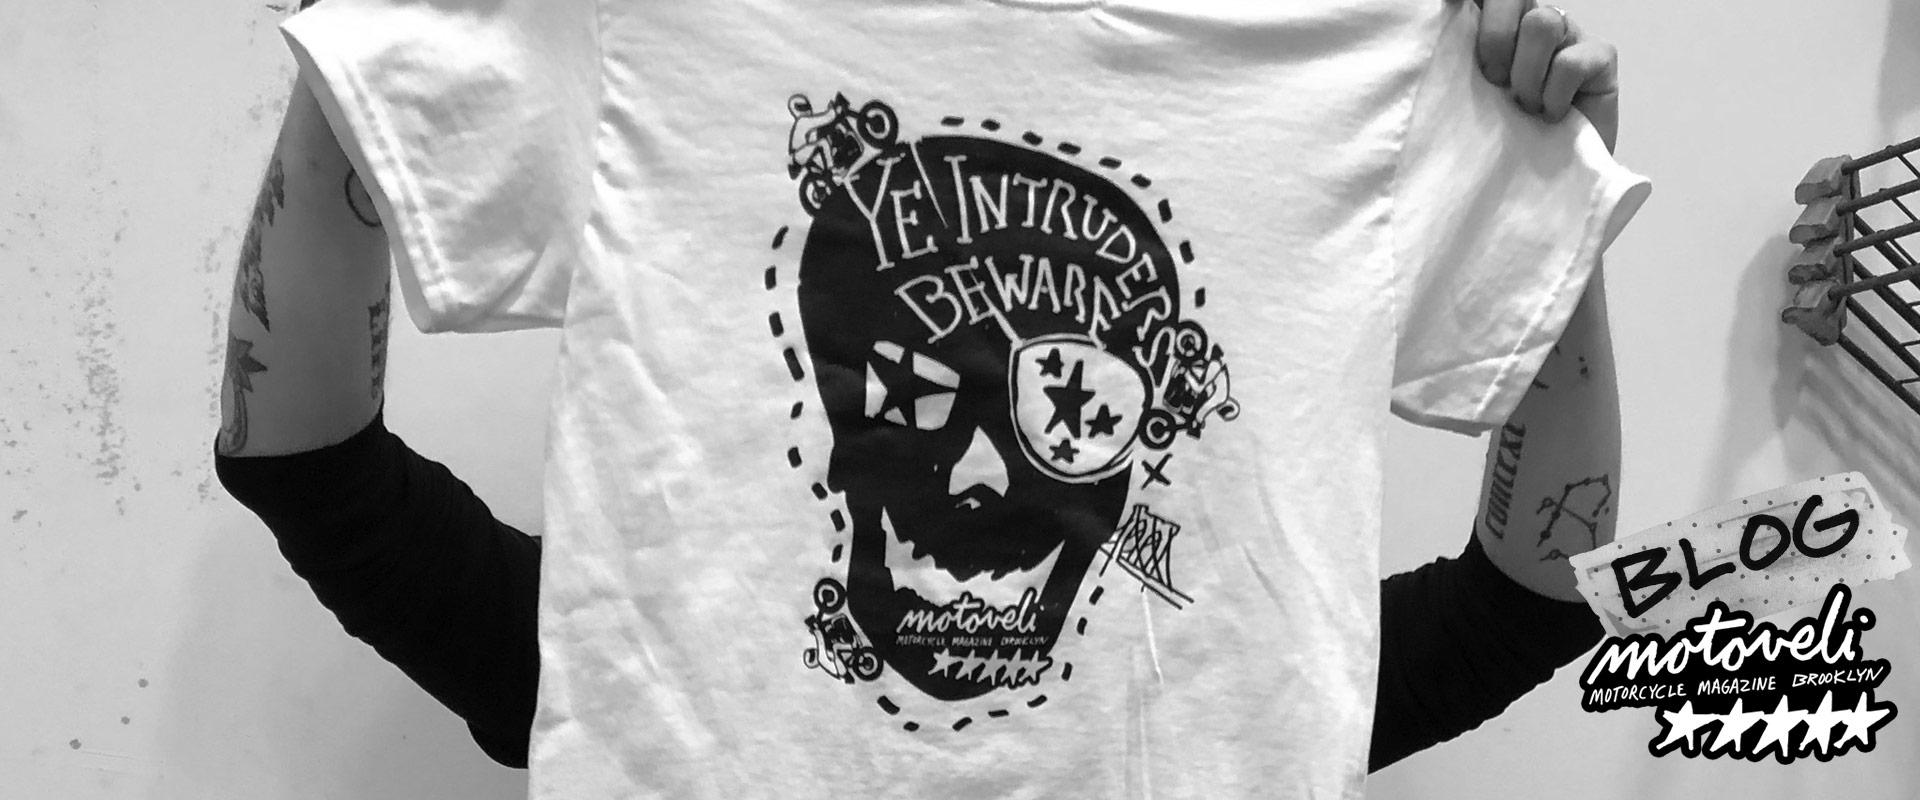 motoveli-shirts.jpg